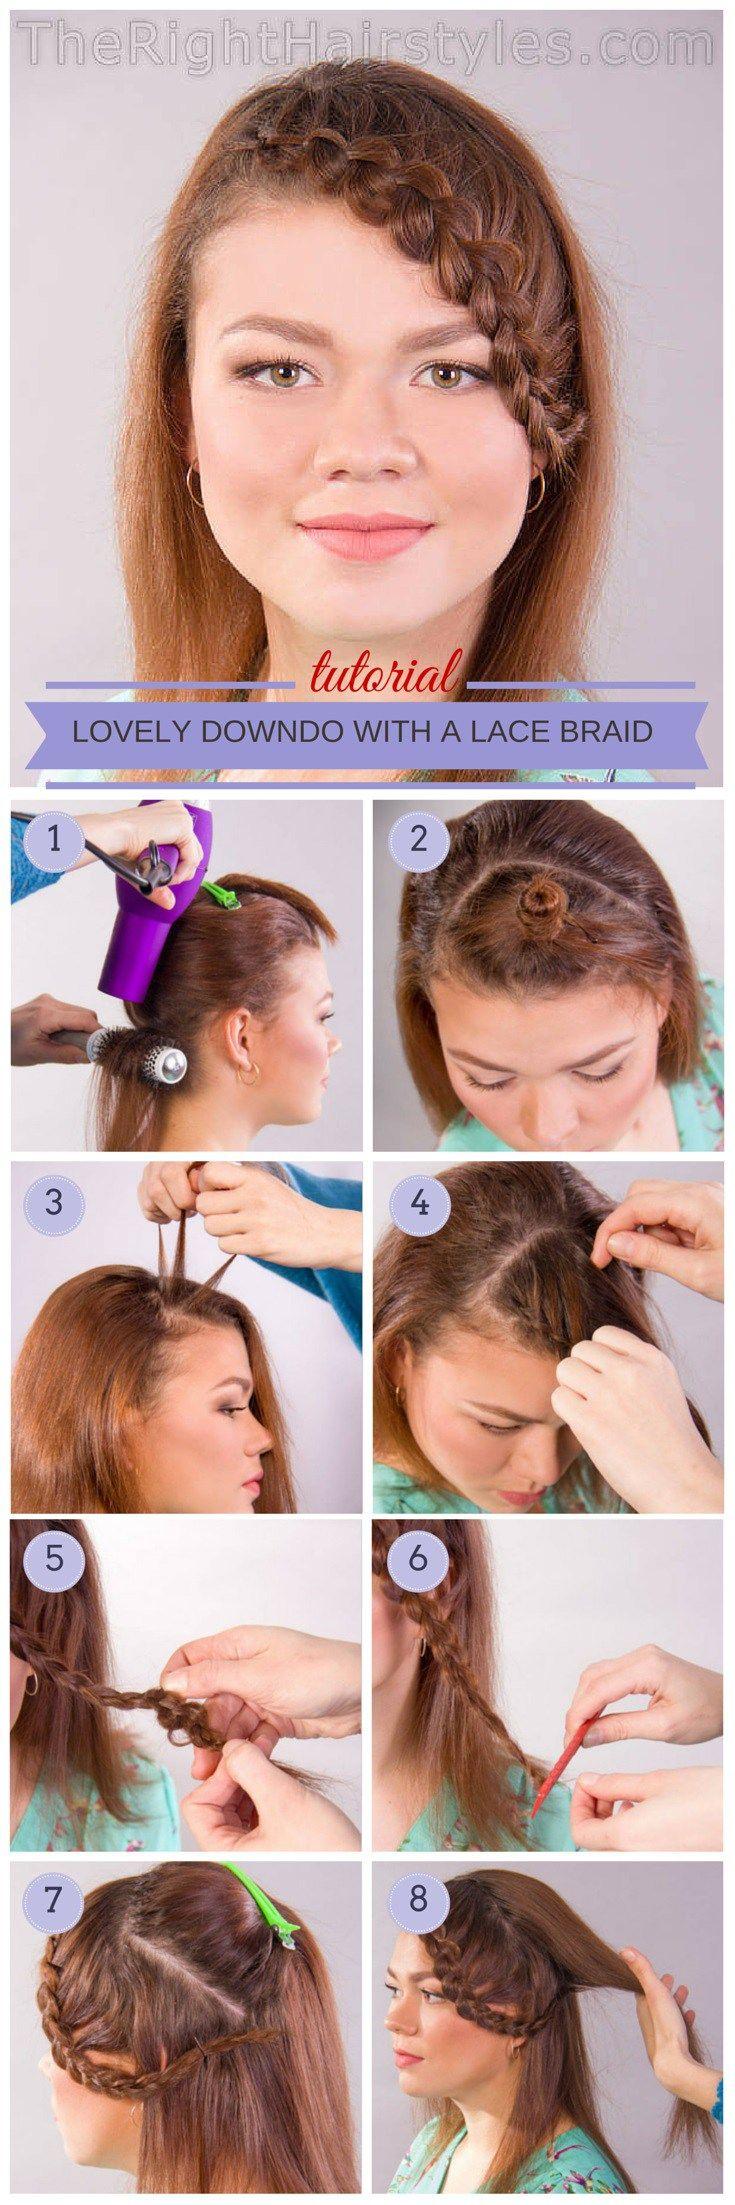 braided bangs tutorial - photo #8